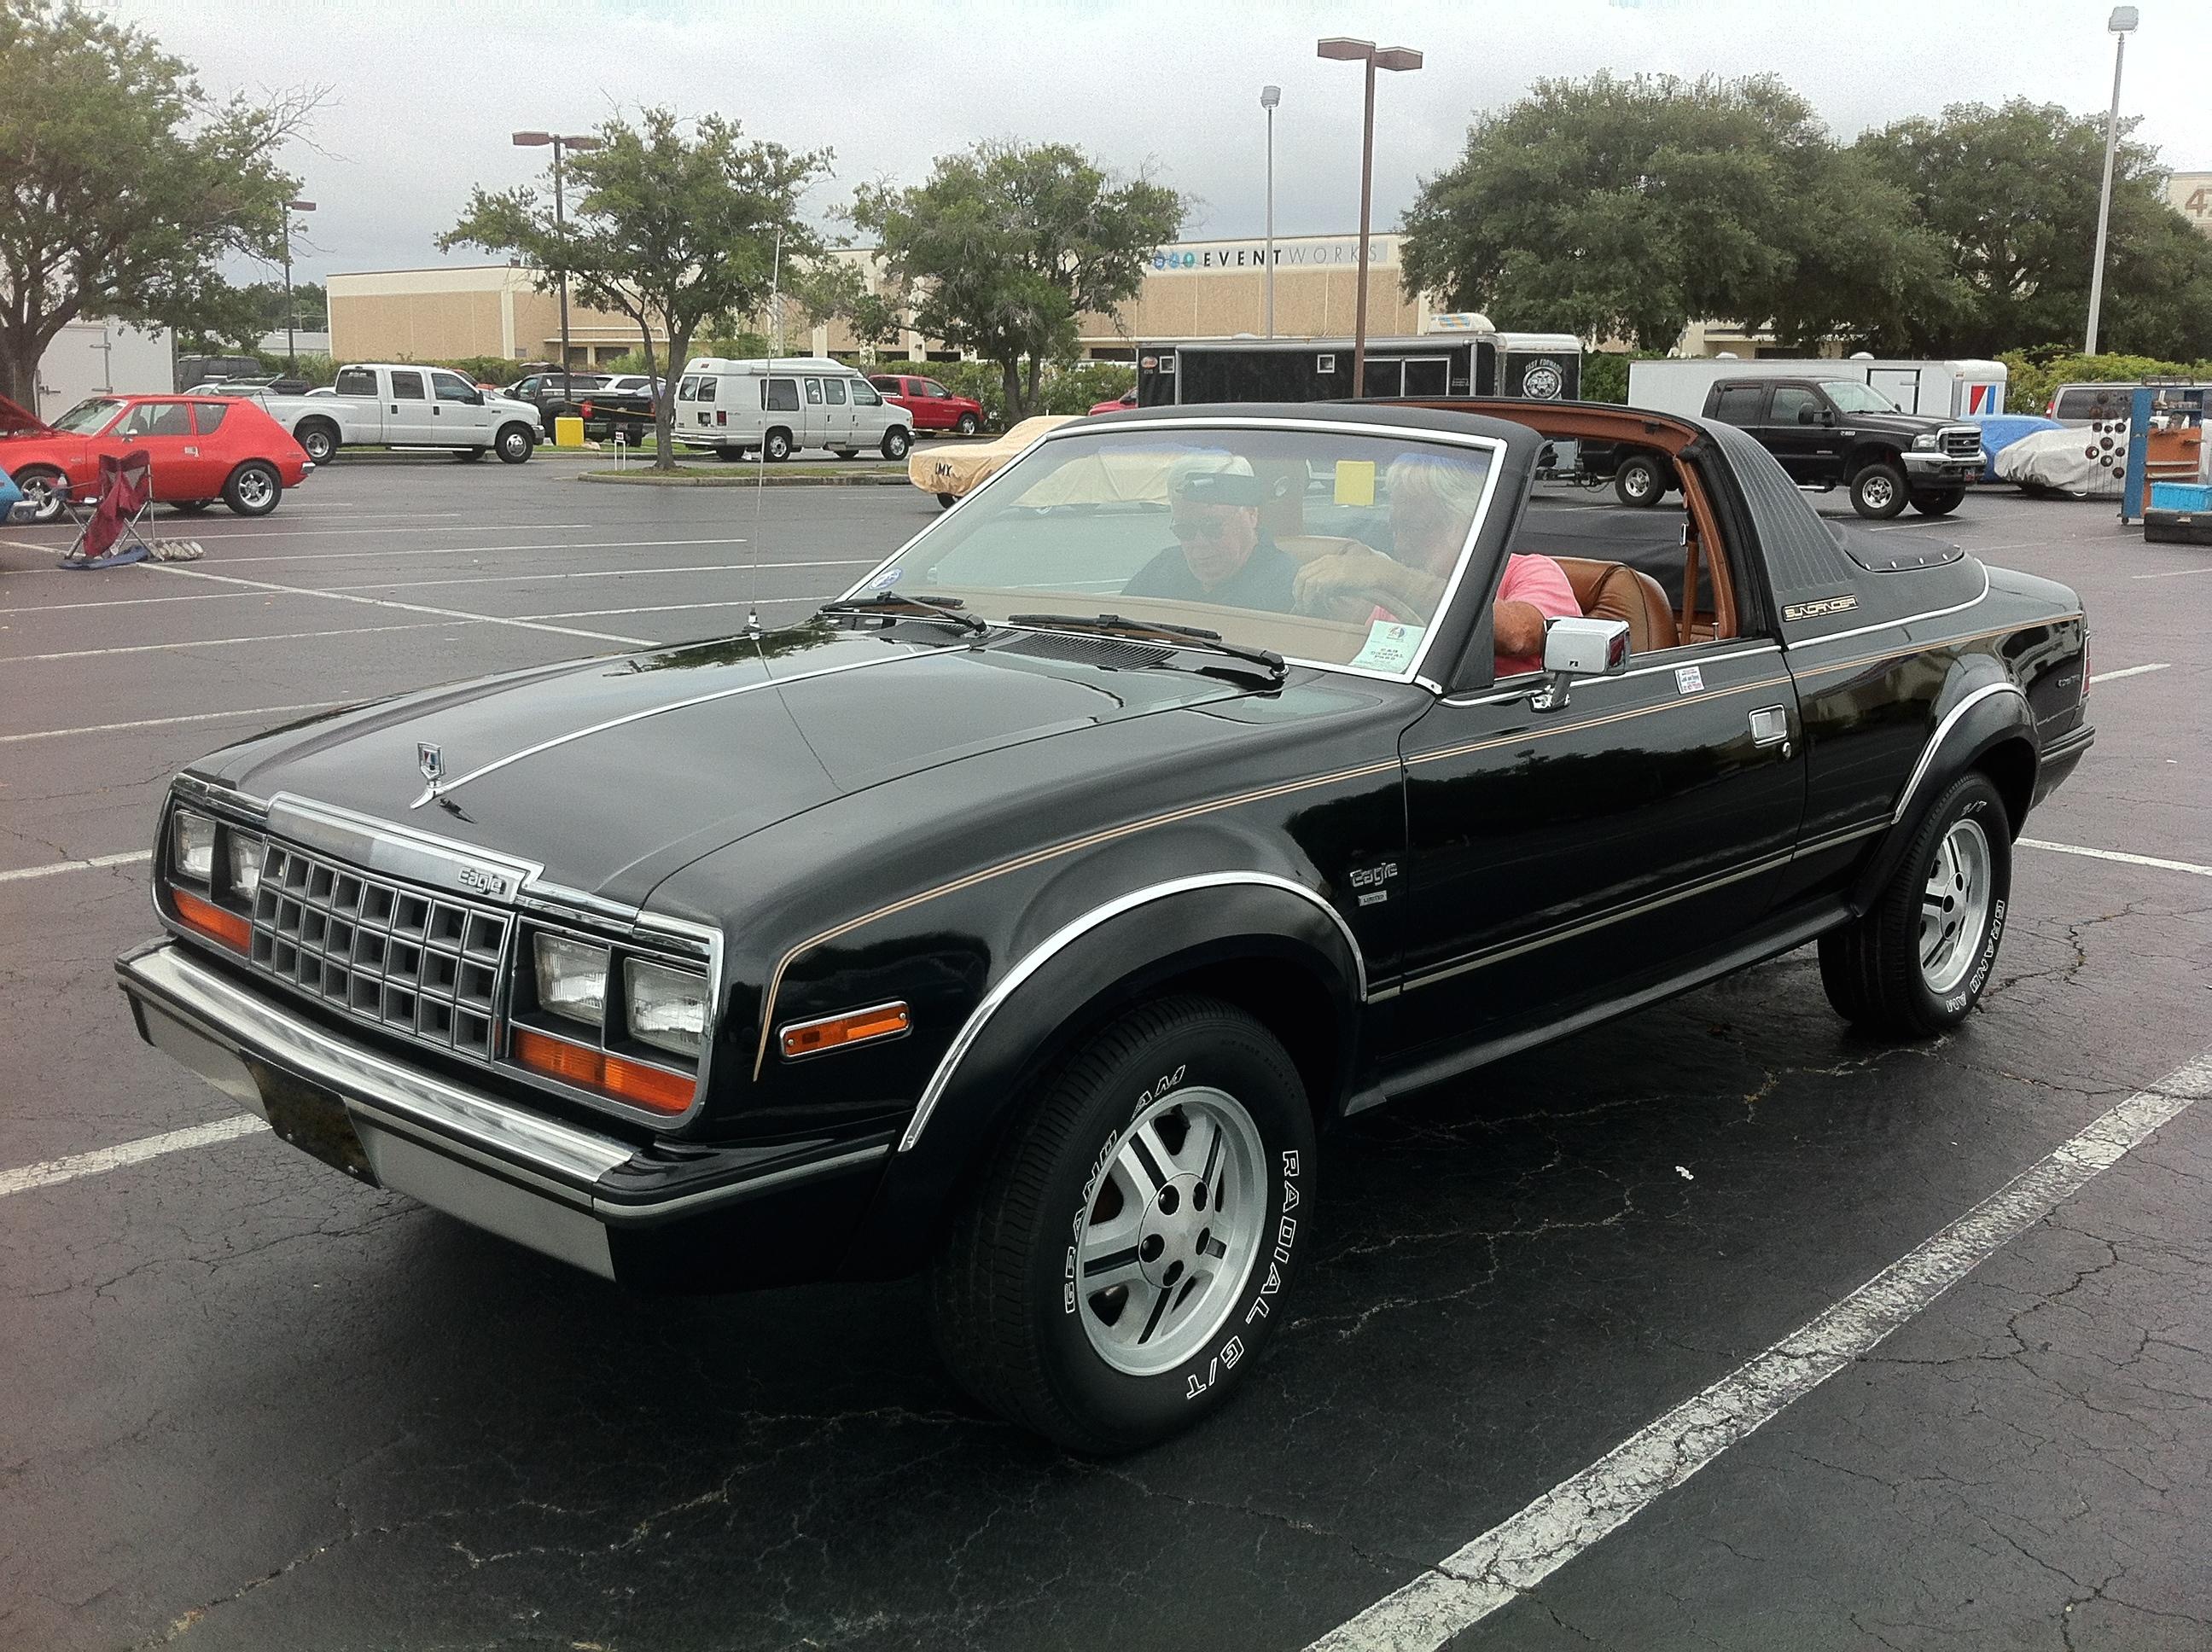 4X4 For Sale >> File:1981 AMC Eagle Sundancer 4WD convertible 2014-AMO-NC-a.jpg - Wikimedia Commons